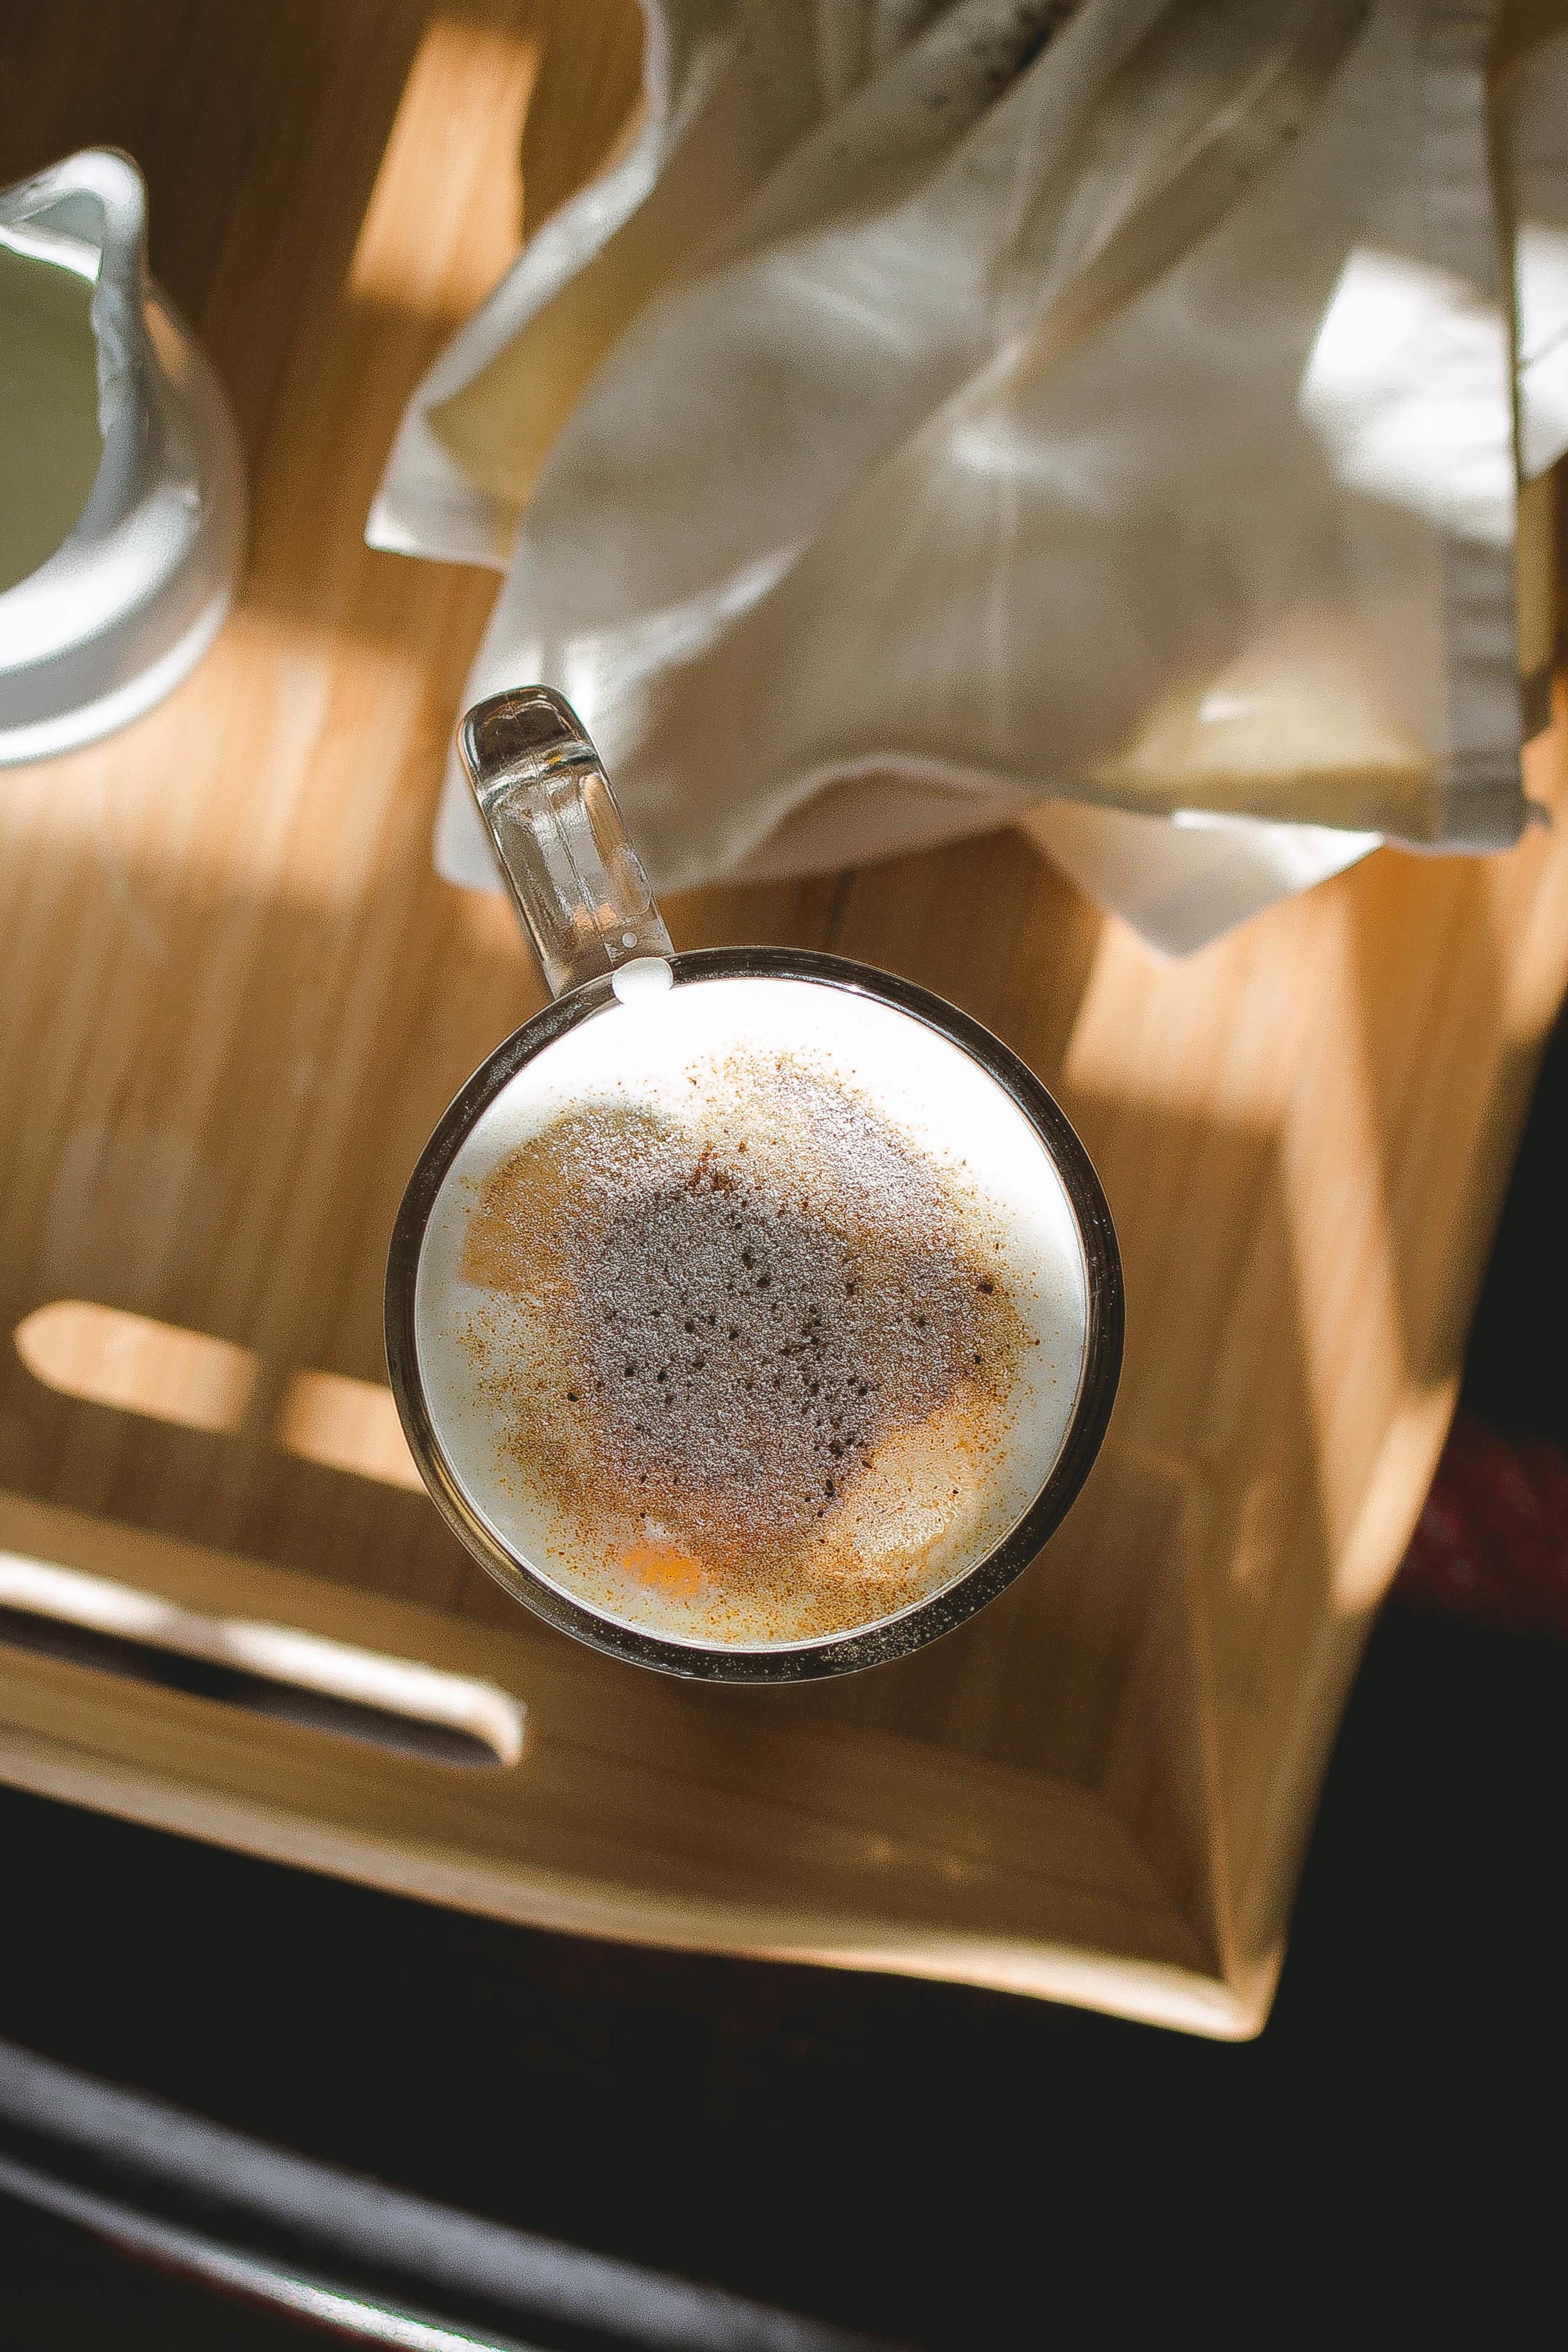 Recipe for Sea salt cream iced coffee like 85 degrees-Taiwanese style drink.jpg